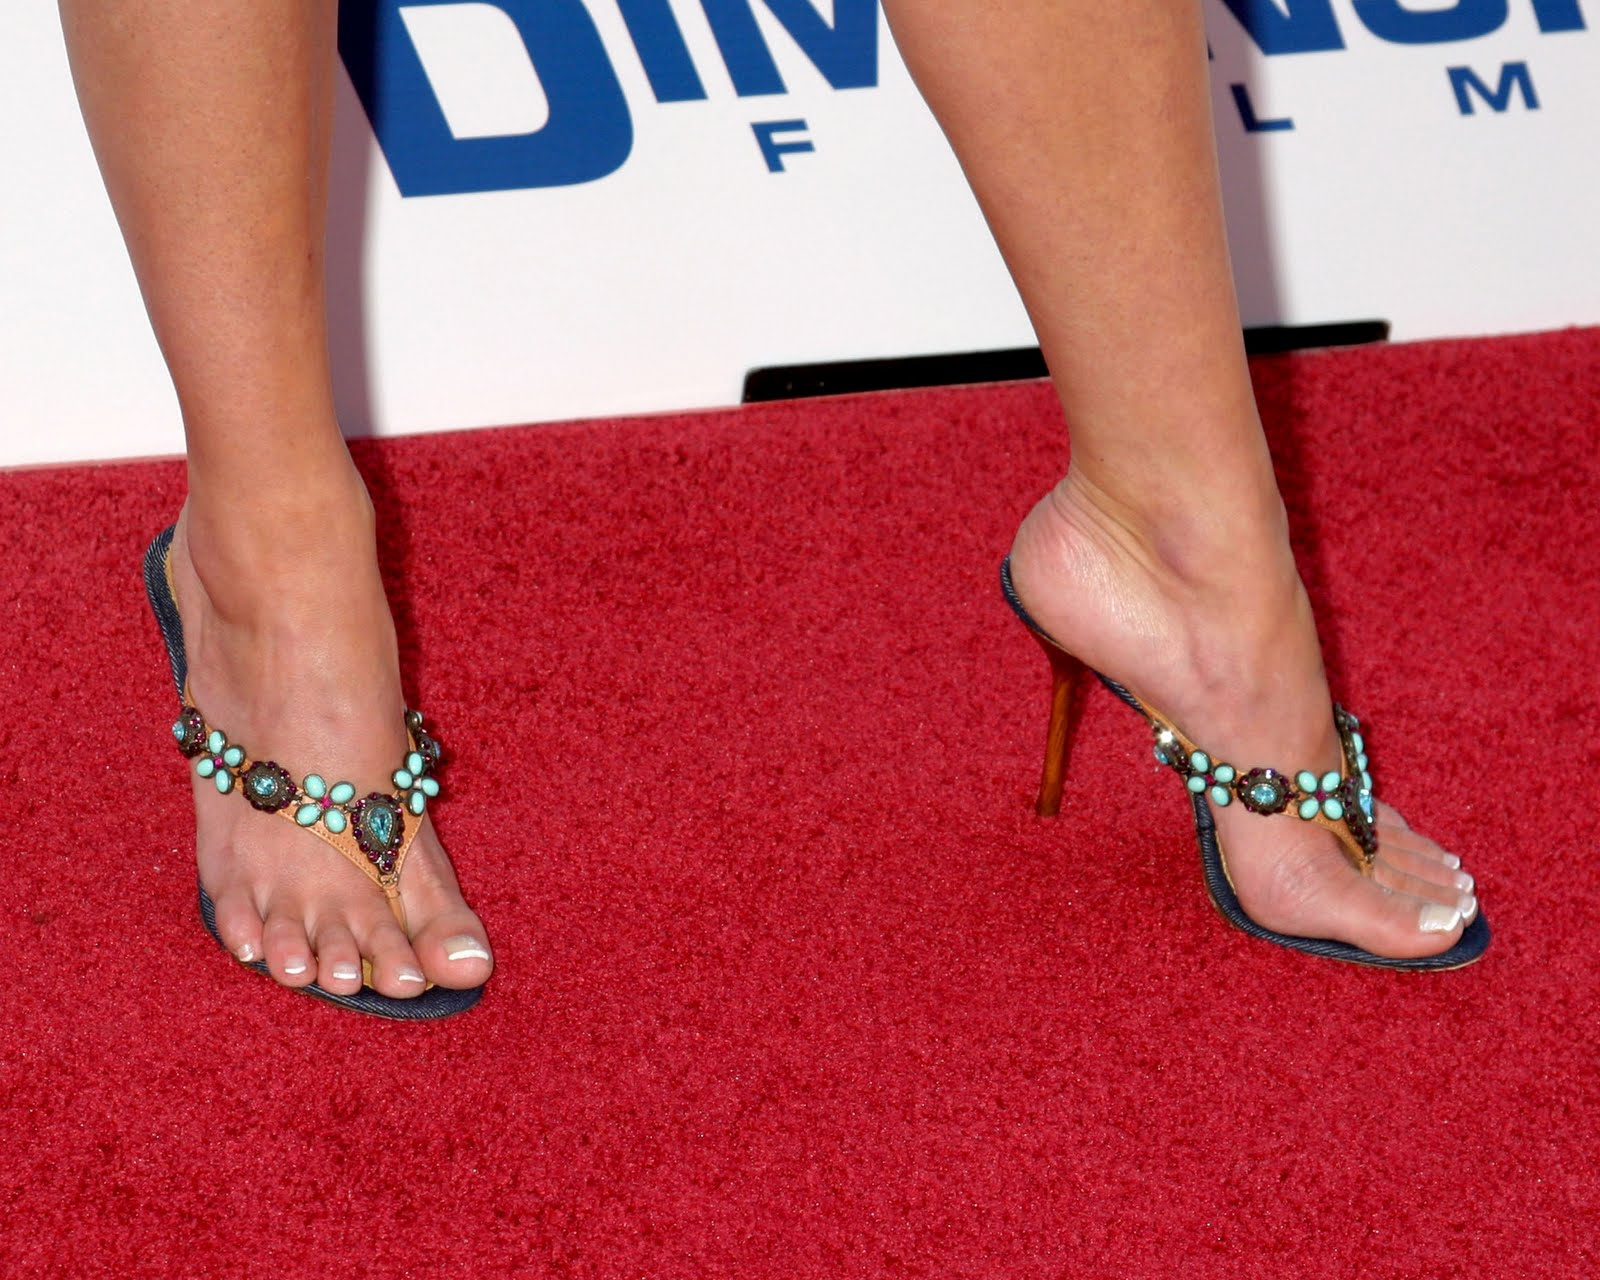 Julianna Margulies Feet Pictures | beta pics Naomi Watts Bio